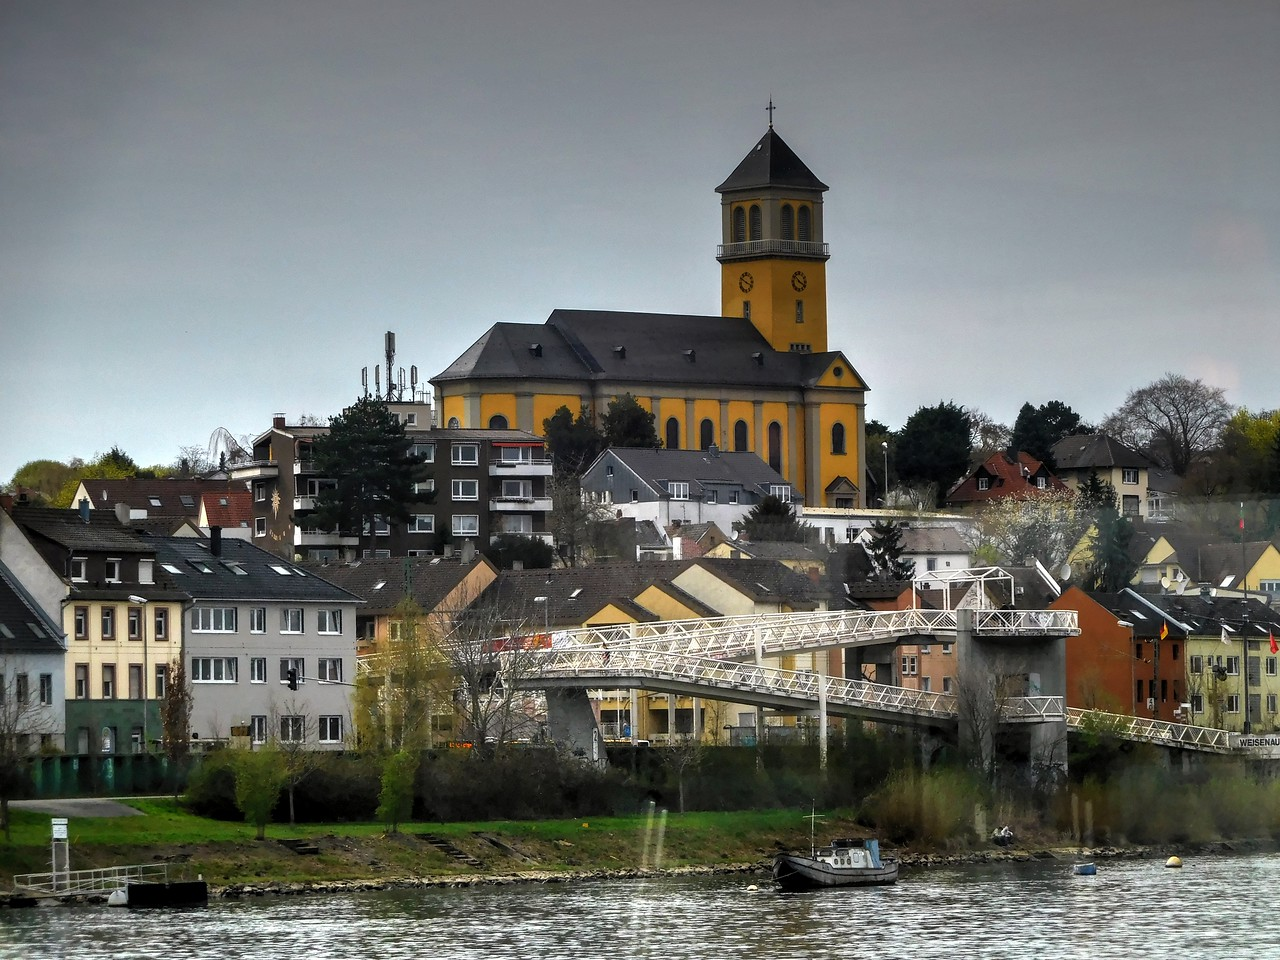 Church in Rudesheim, Germany